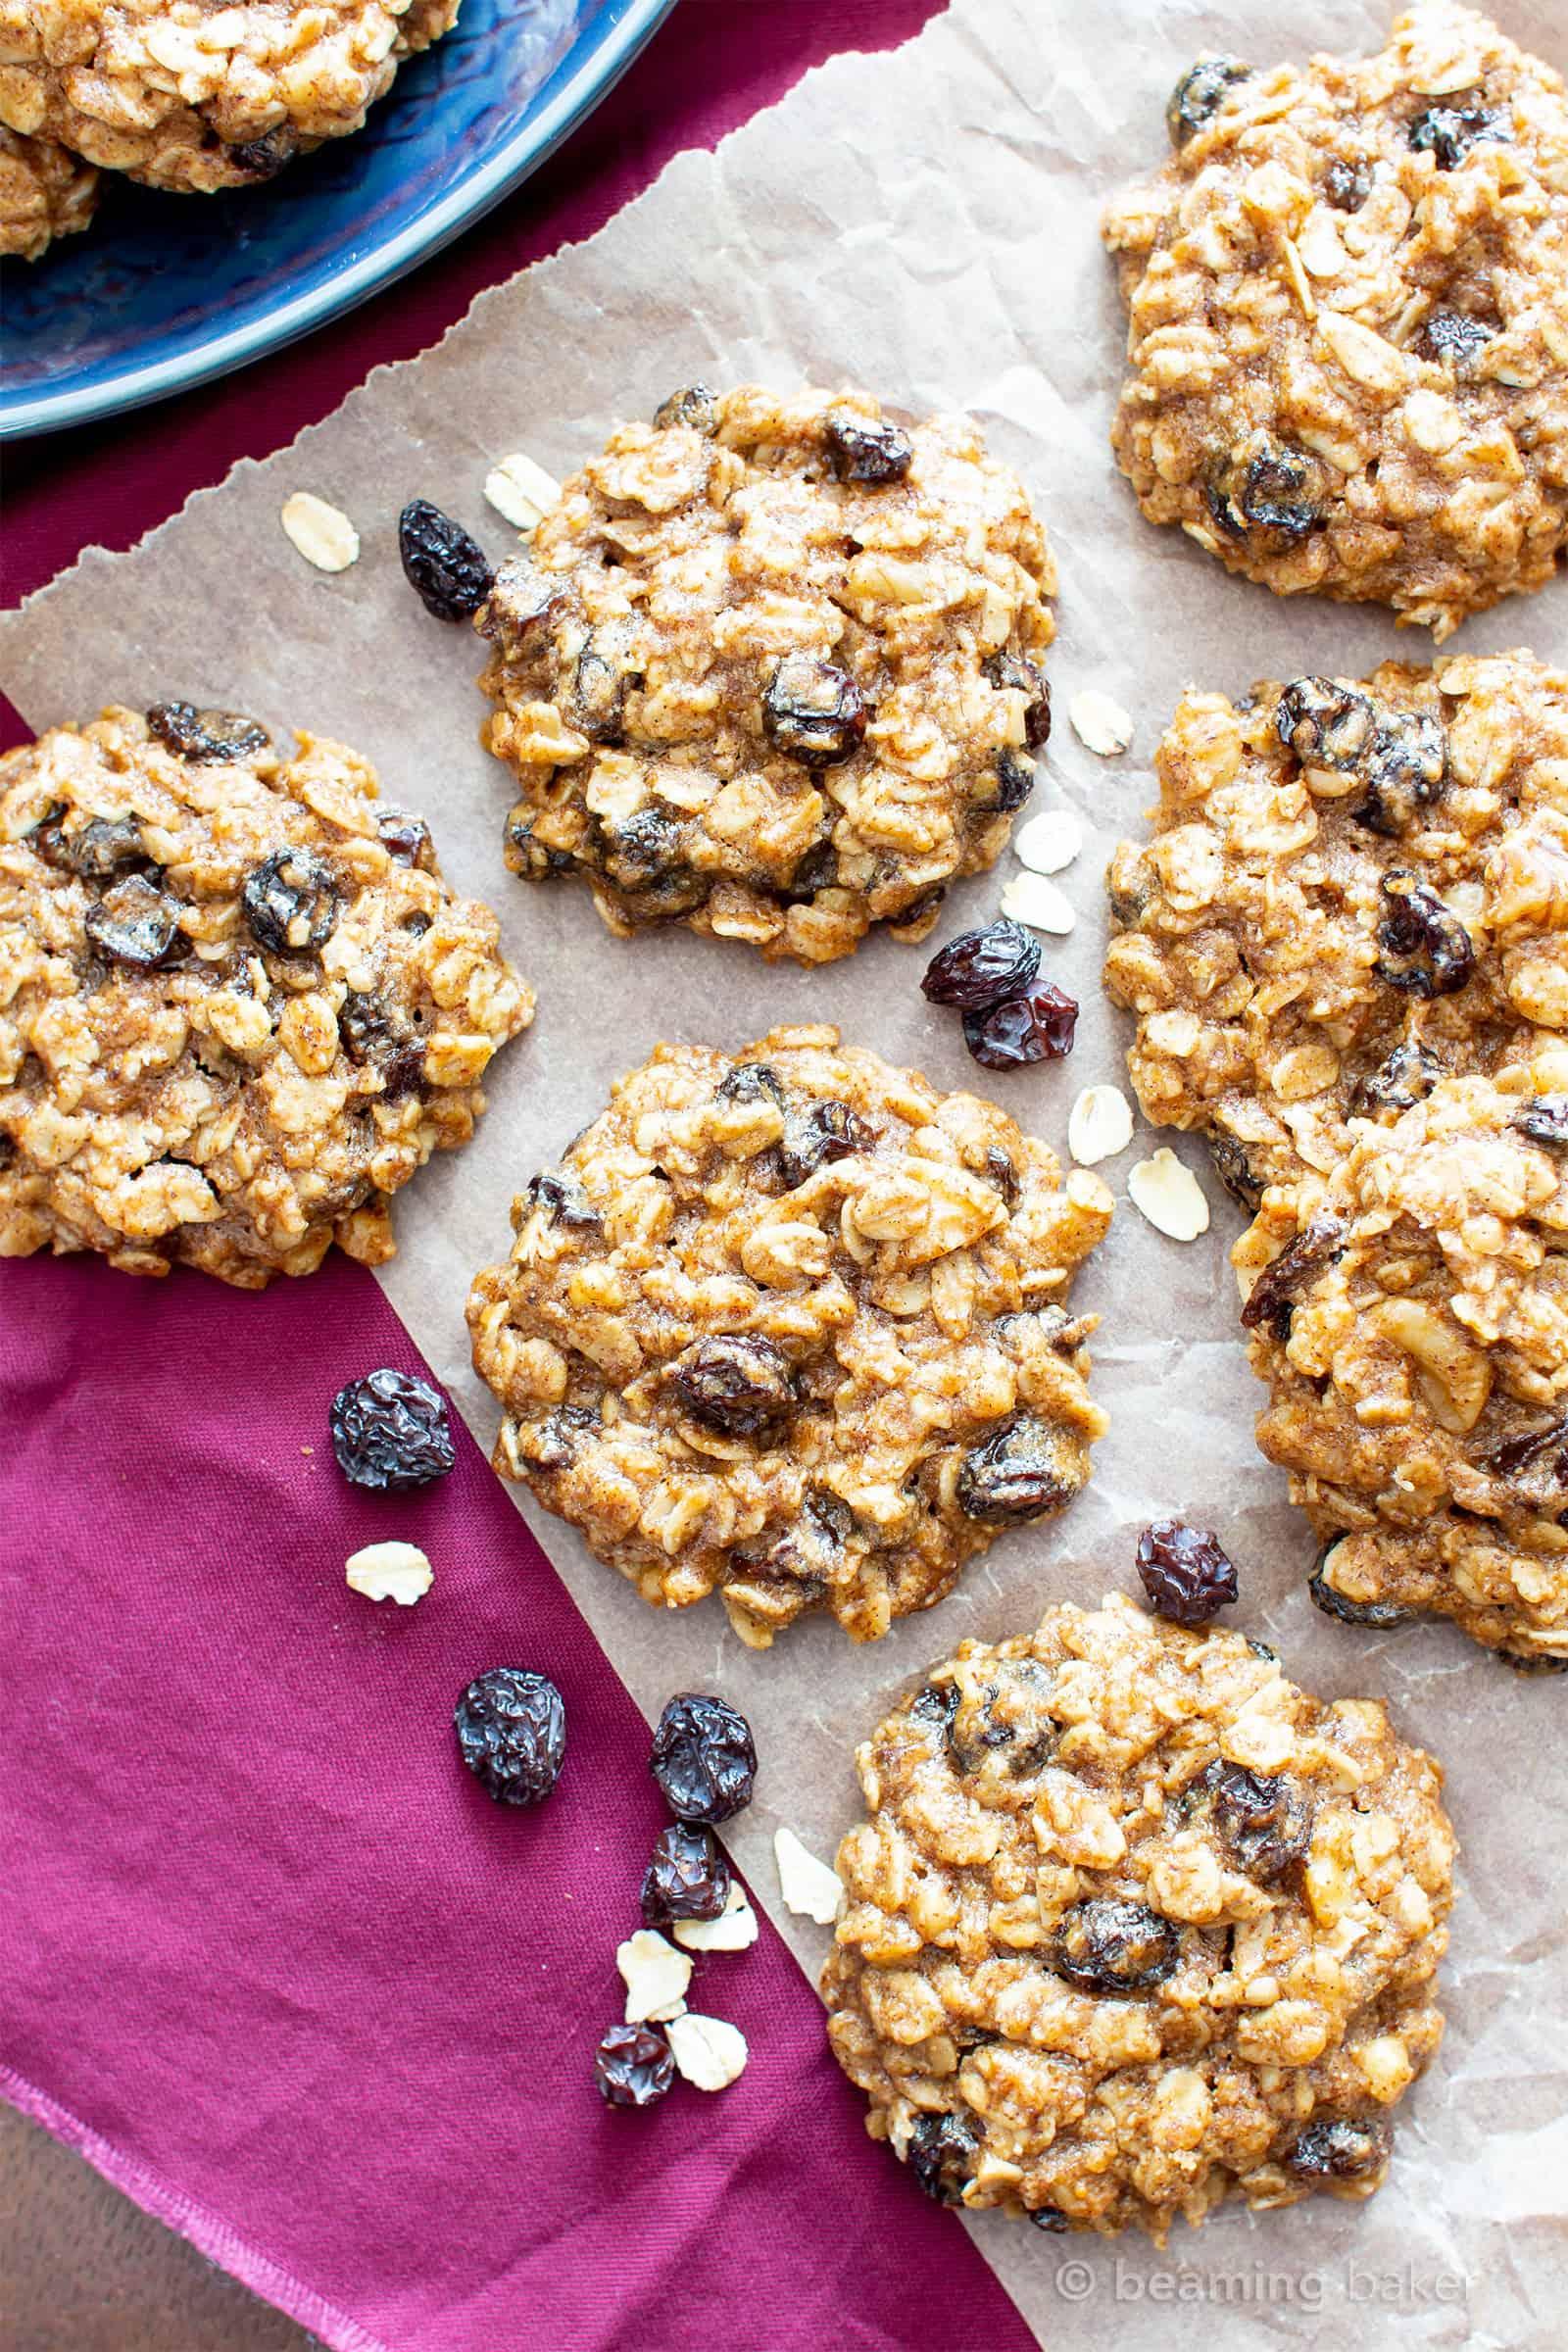 Chewy-Oatmeal-Raisin-Cookie-Recipe-Vegan-Gluten-Free-Refined-Sugar-Free-1.jpg